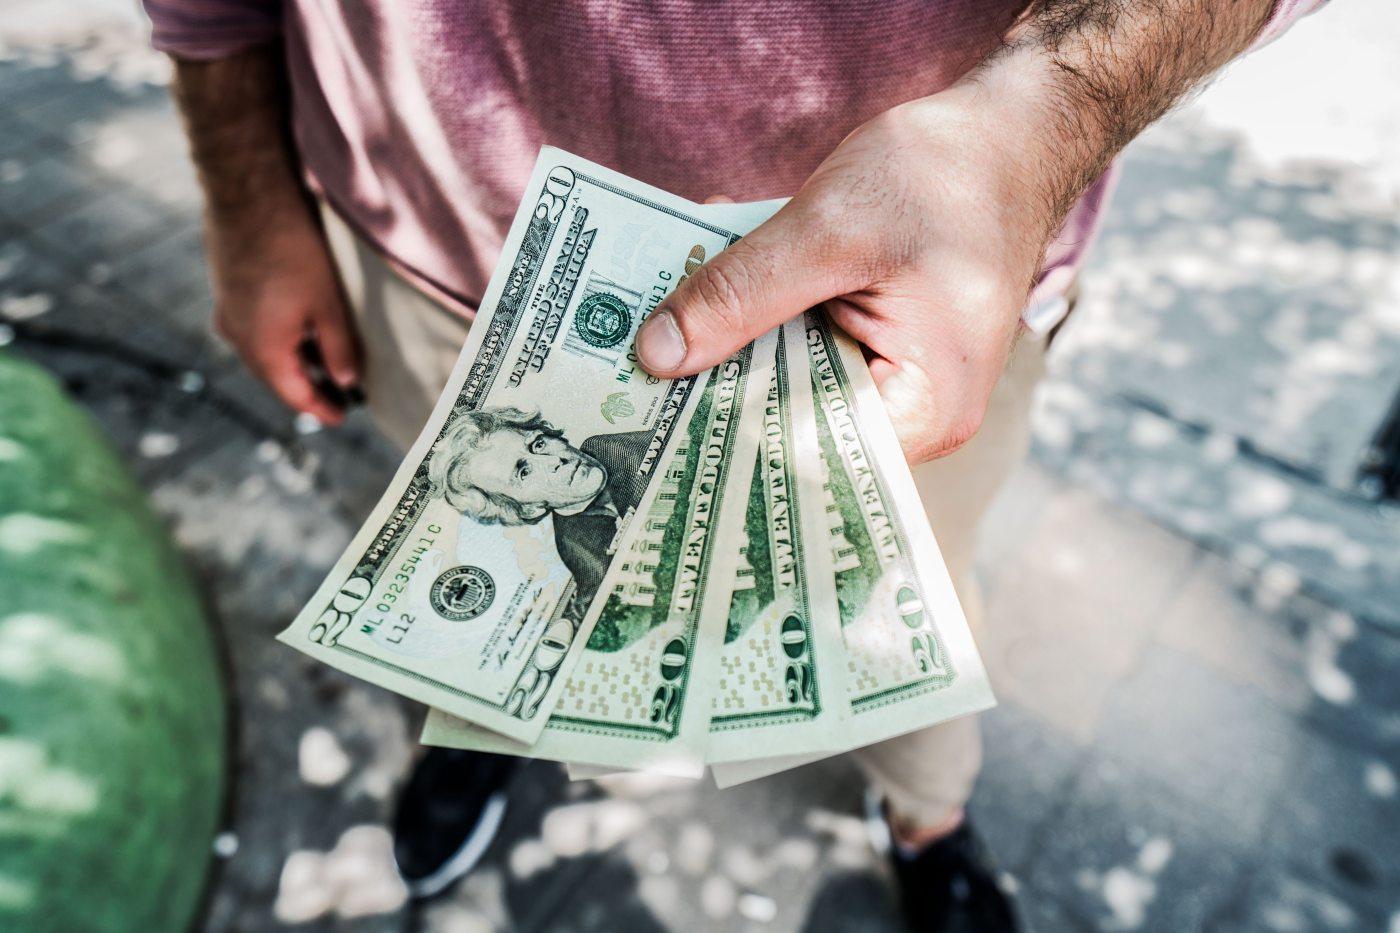 Cash loans in connecticut picture 4